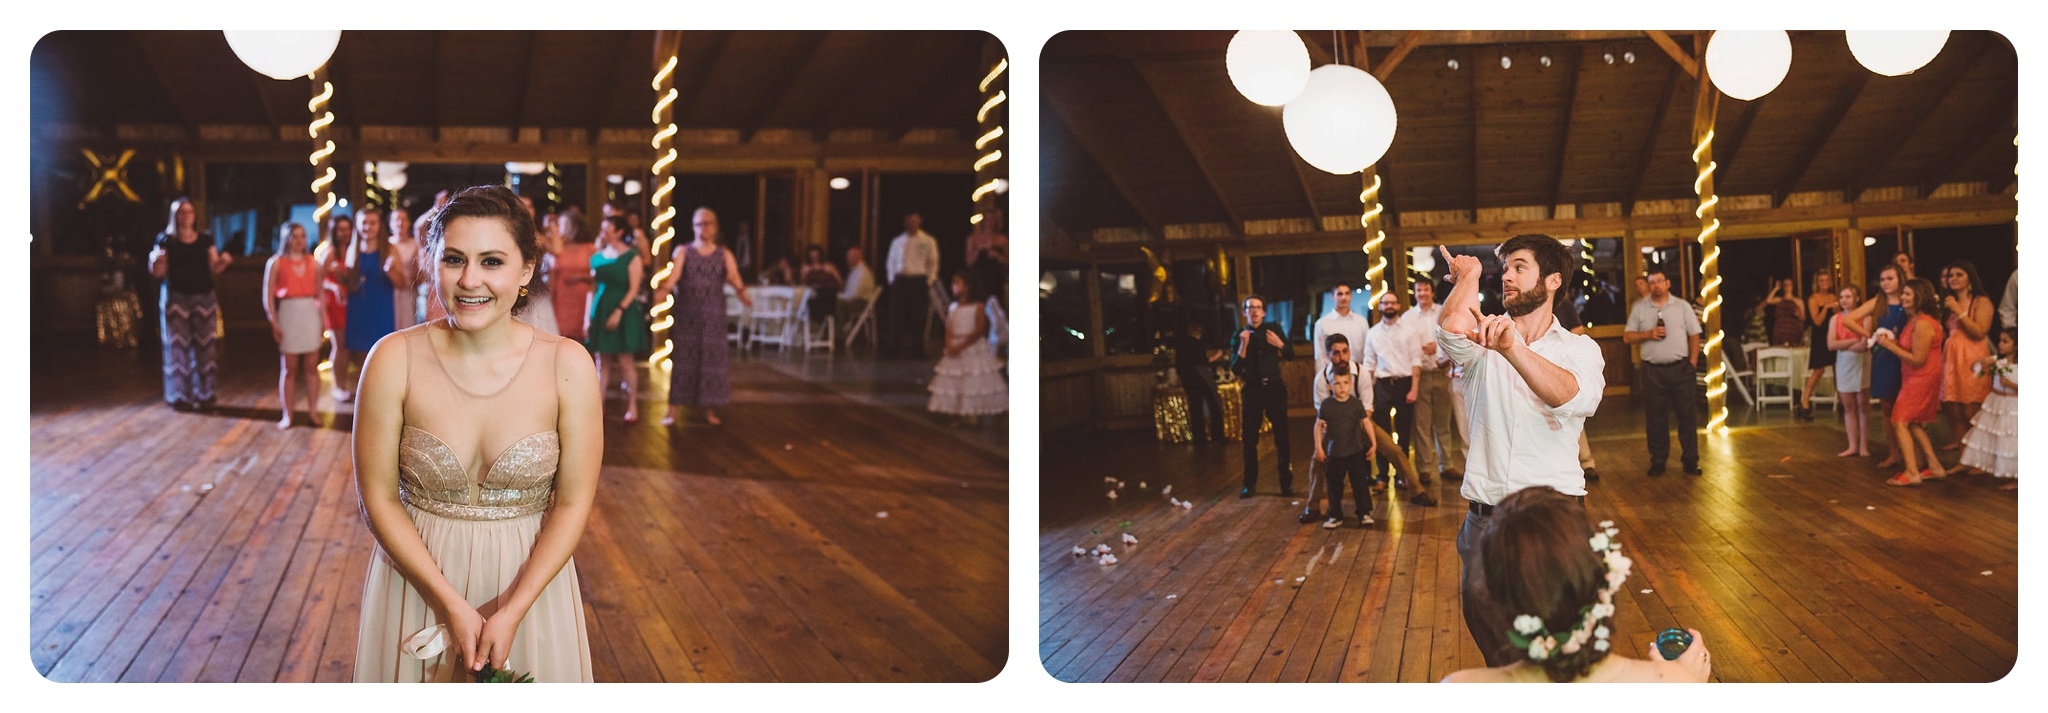 Braeloch-Weddings-Wedding-Photographer-Pat-Cori-Photography-047.jpg